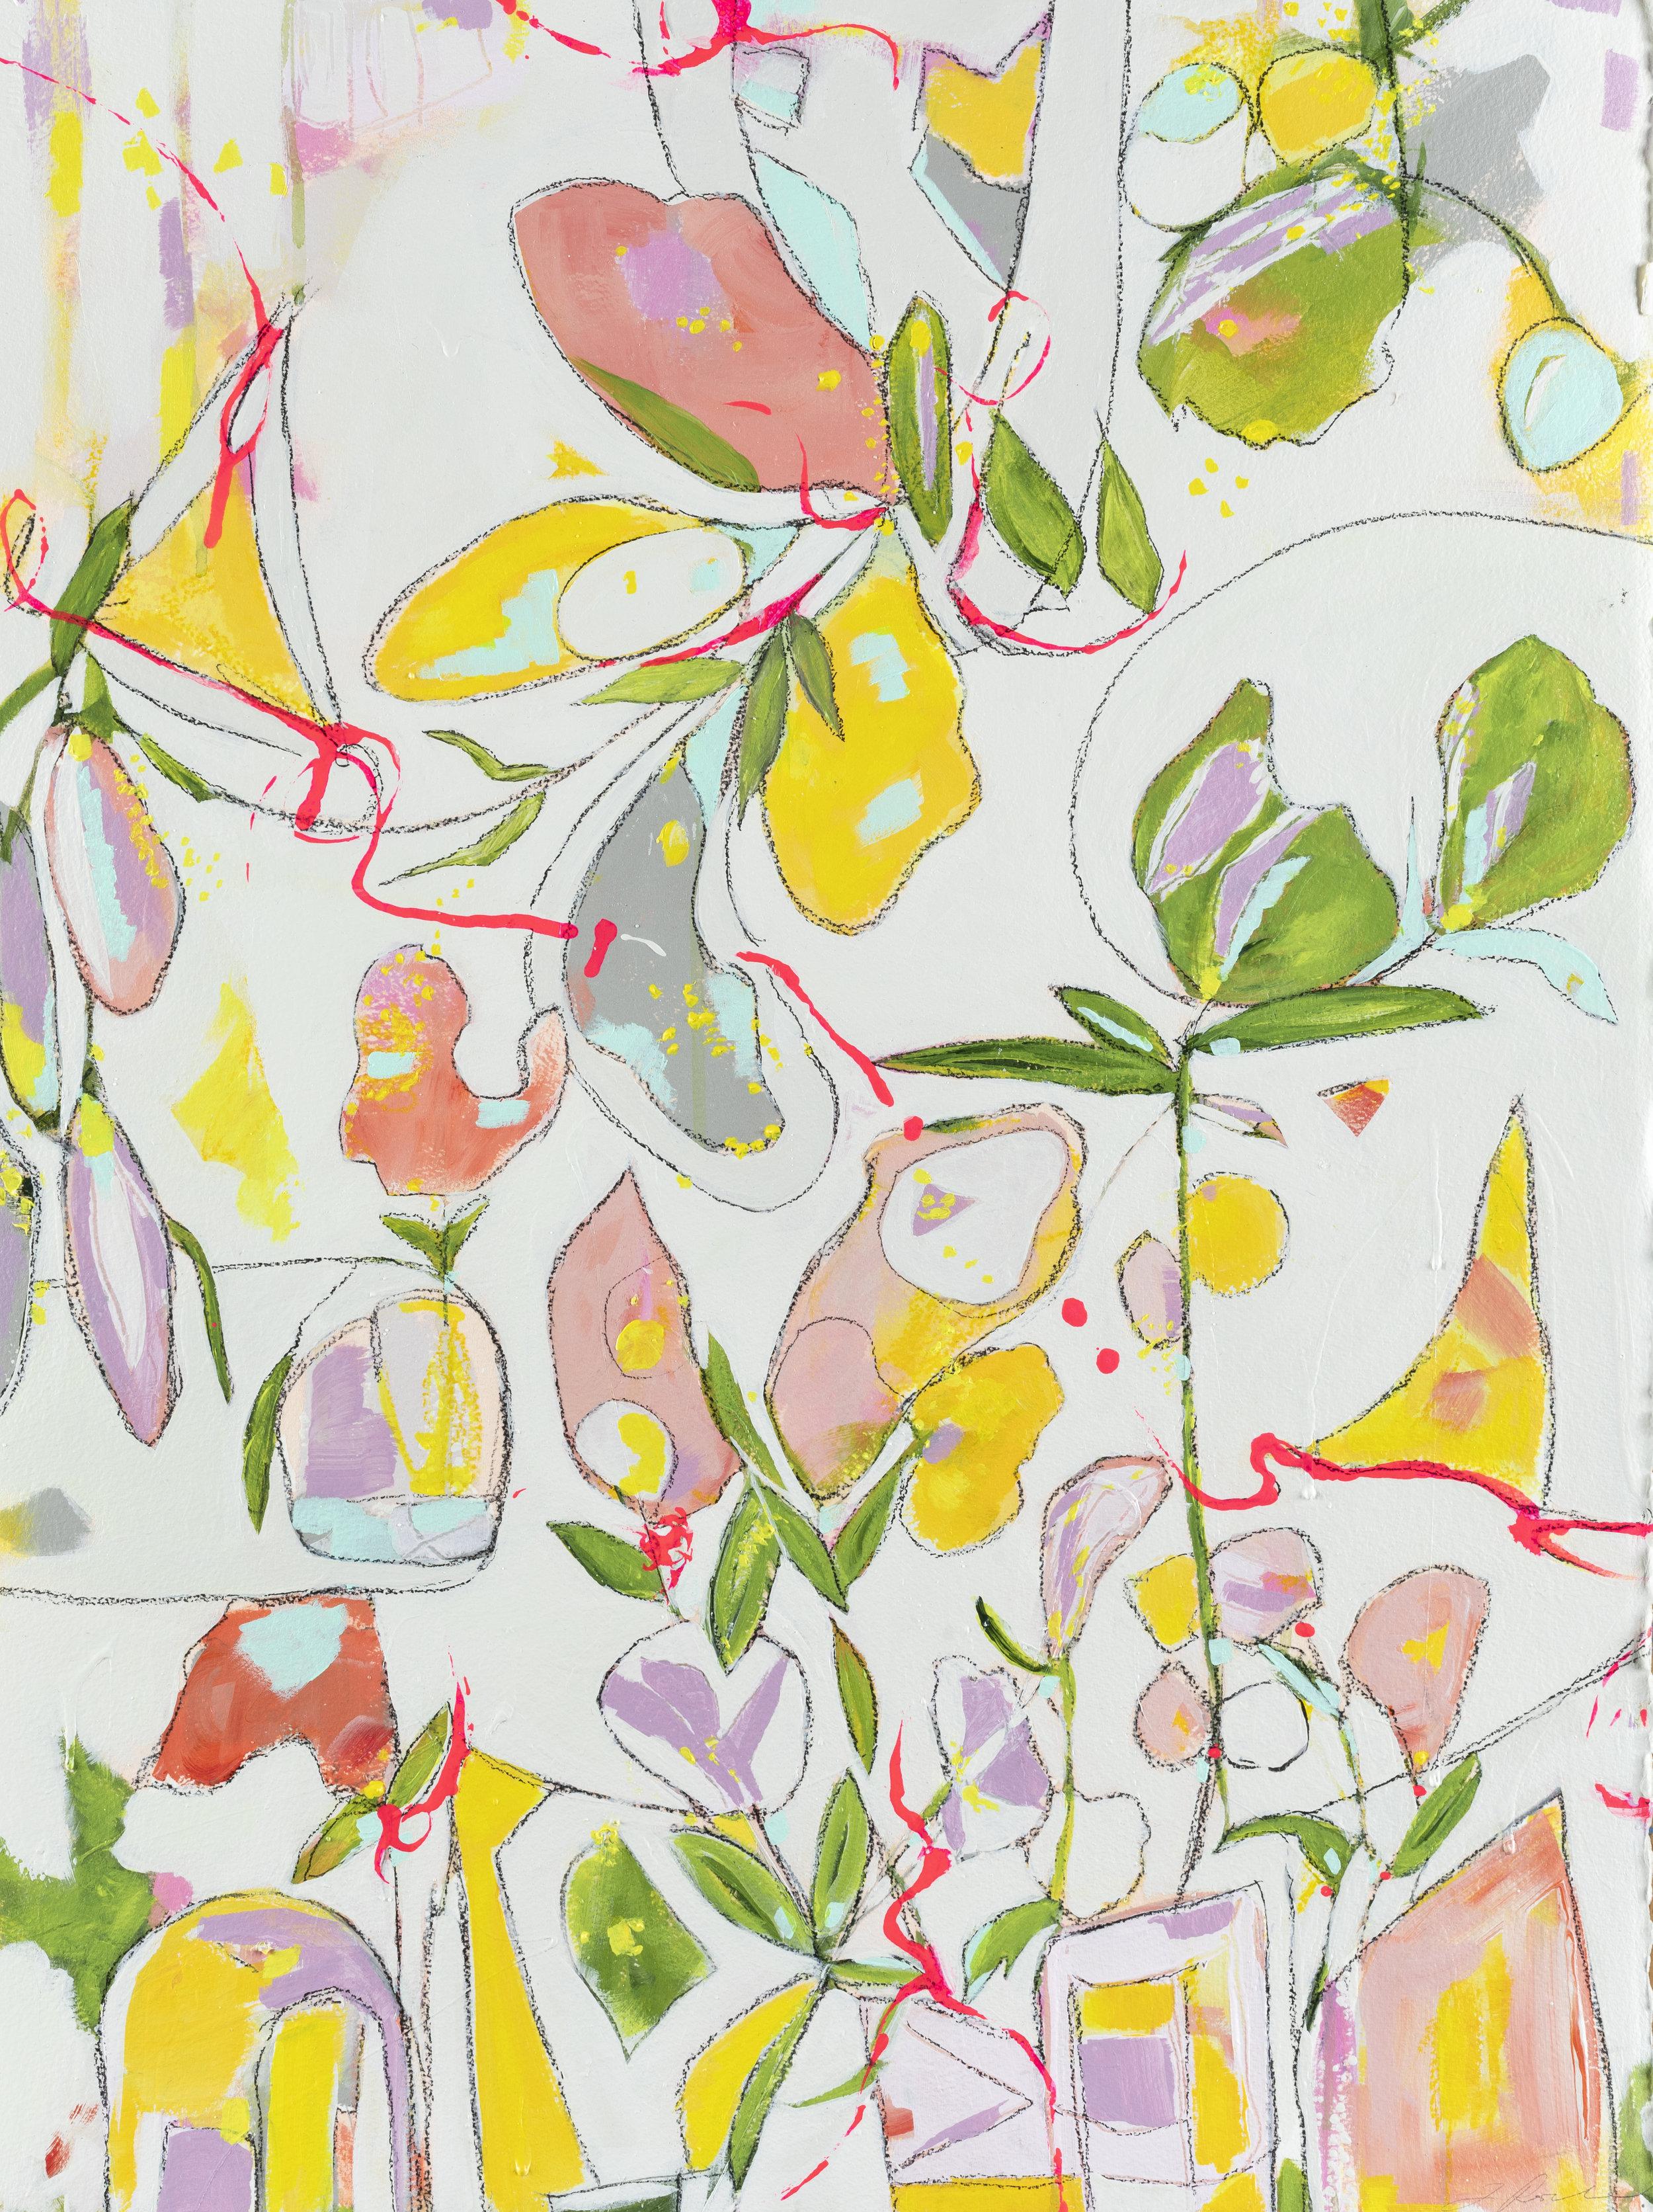 "Mischief in the Garden, 33"" x 25"", available - Miller Gallery Charleston"